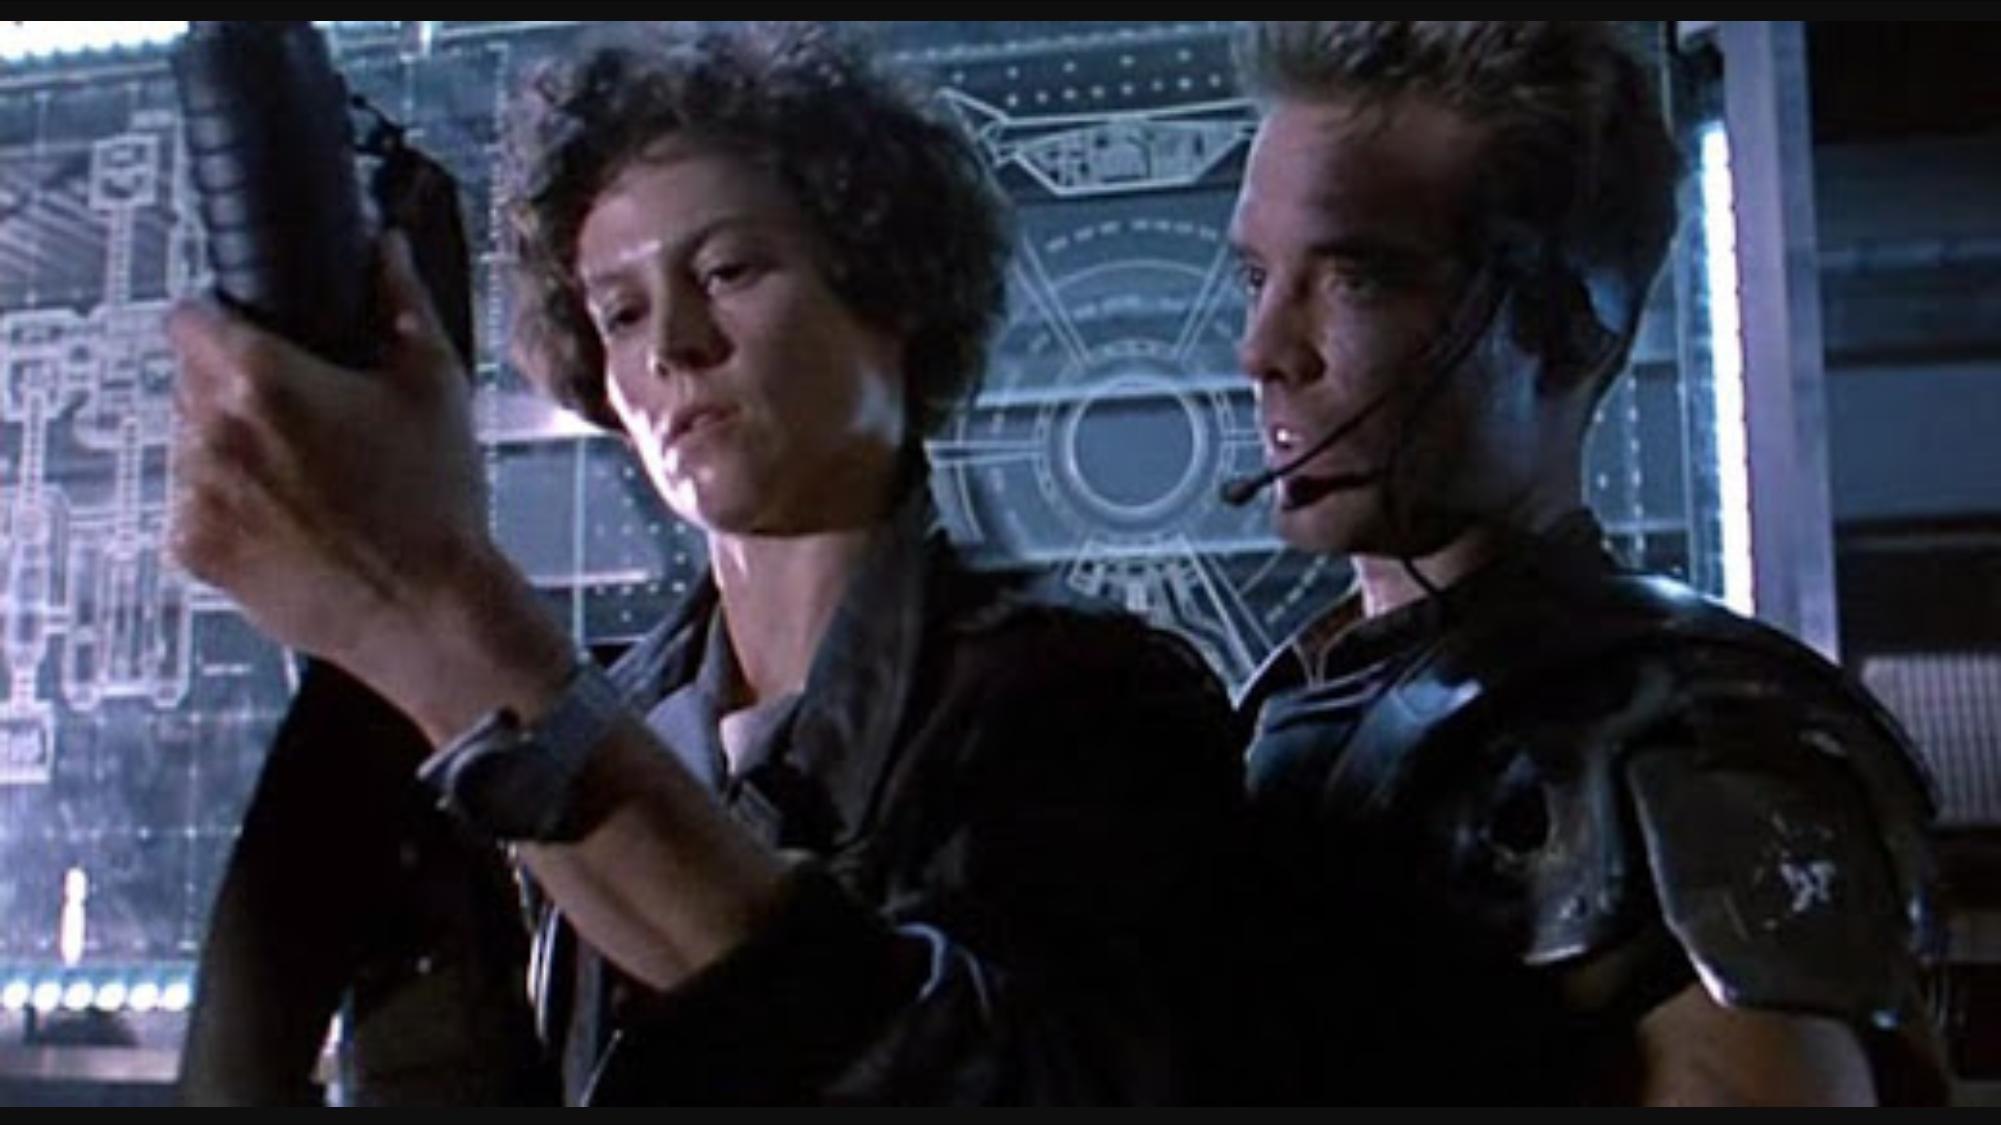 Seiko-Giugiaro-Aliens-Ripley-Watch-10-.png